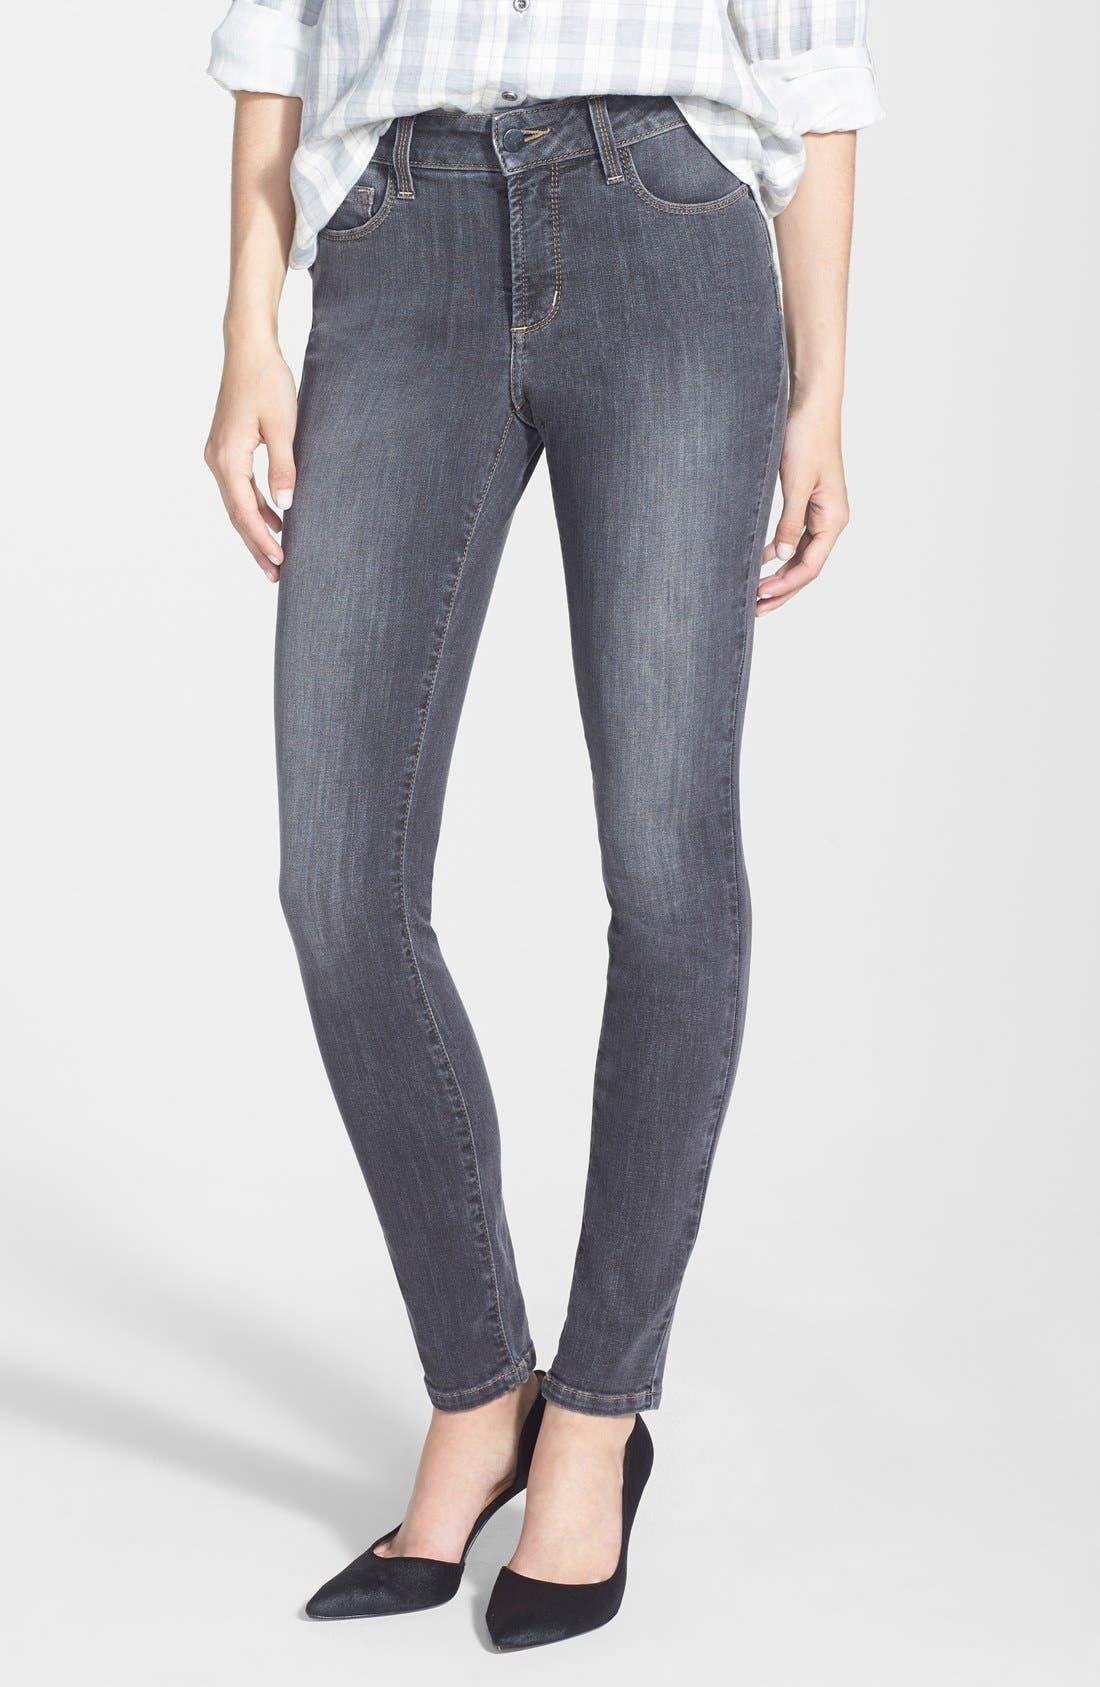 Main Image - NYDJ 'Ami' Stretch Skinny Jeans (Dakota) (Regular & Petite)